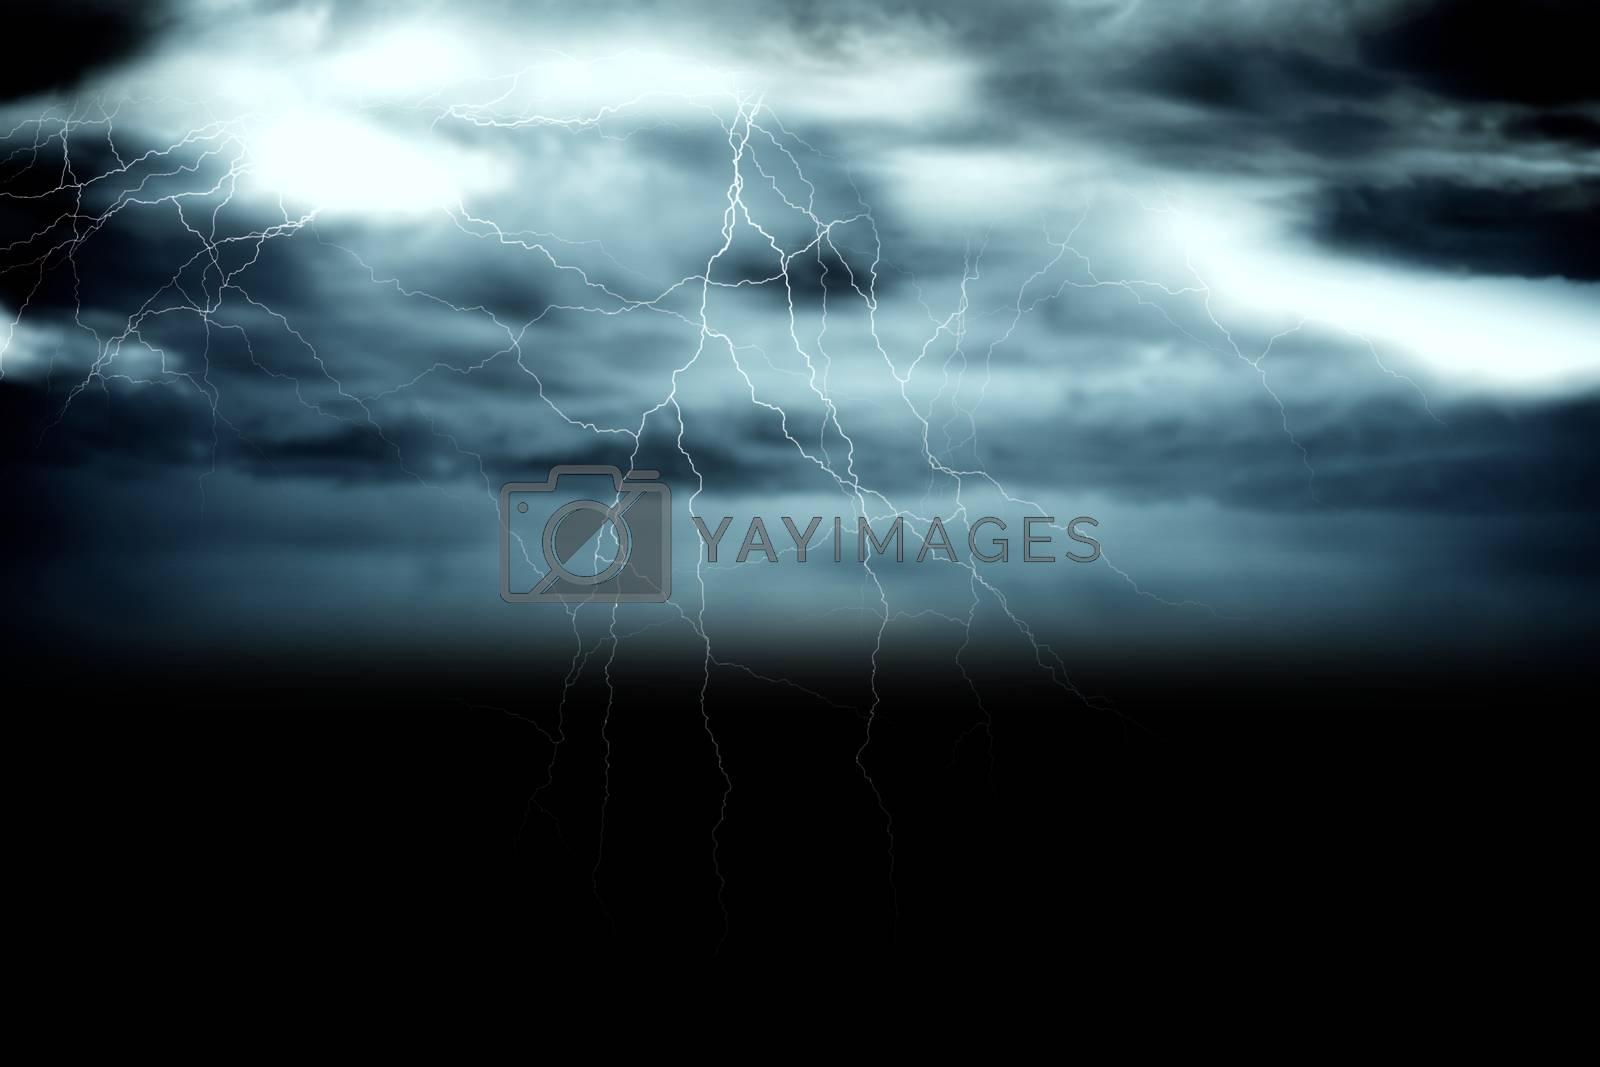 Royalty free image of Stormy dark sky with lightning bolts by Wavebreakmedia